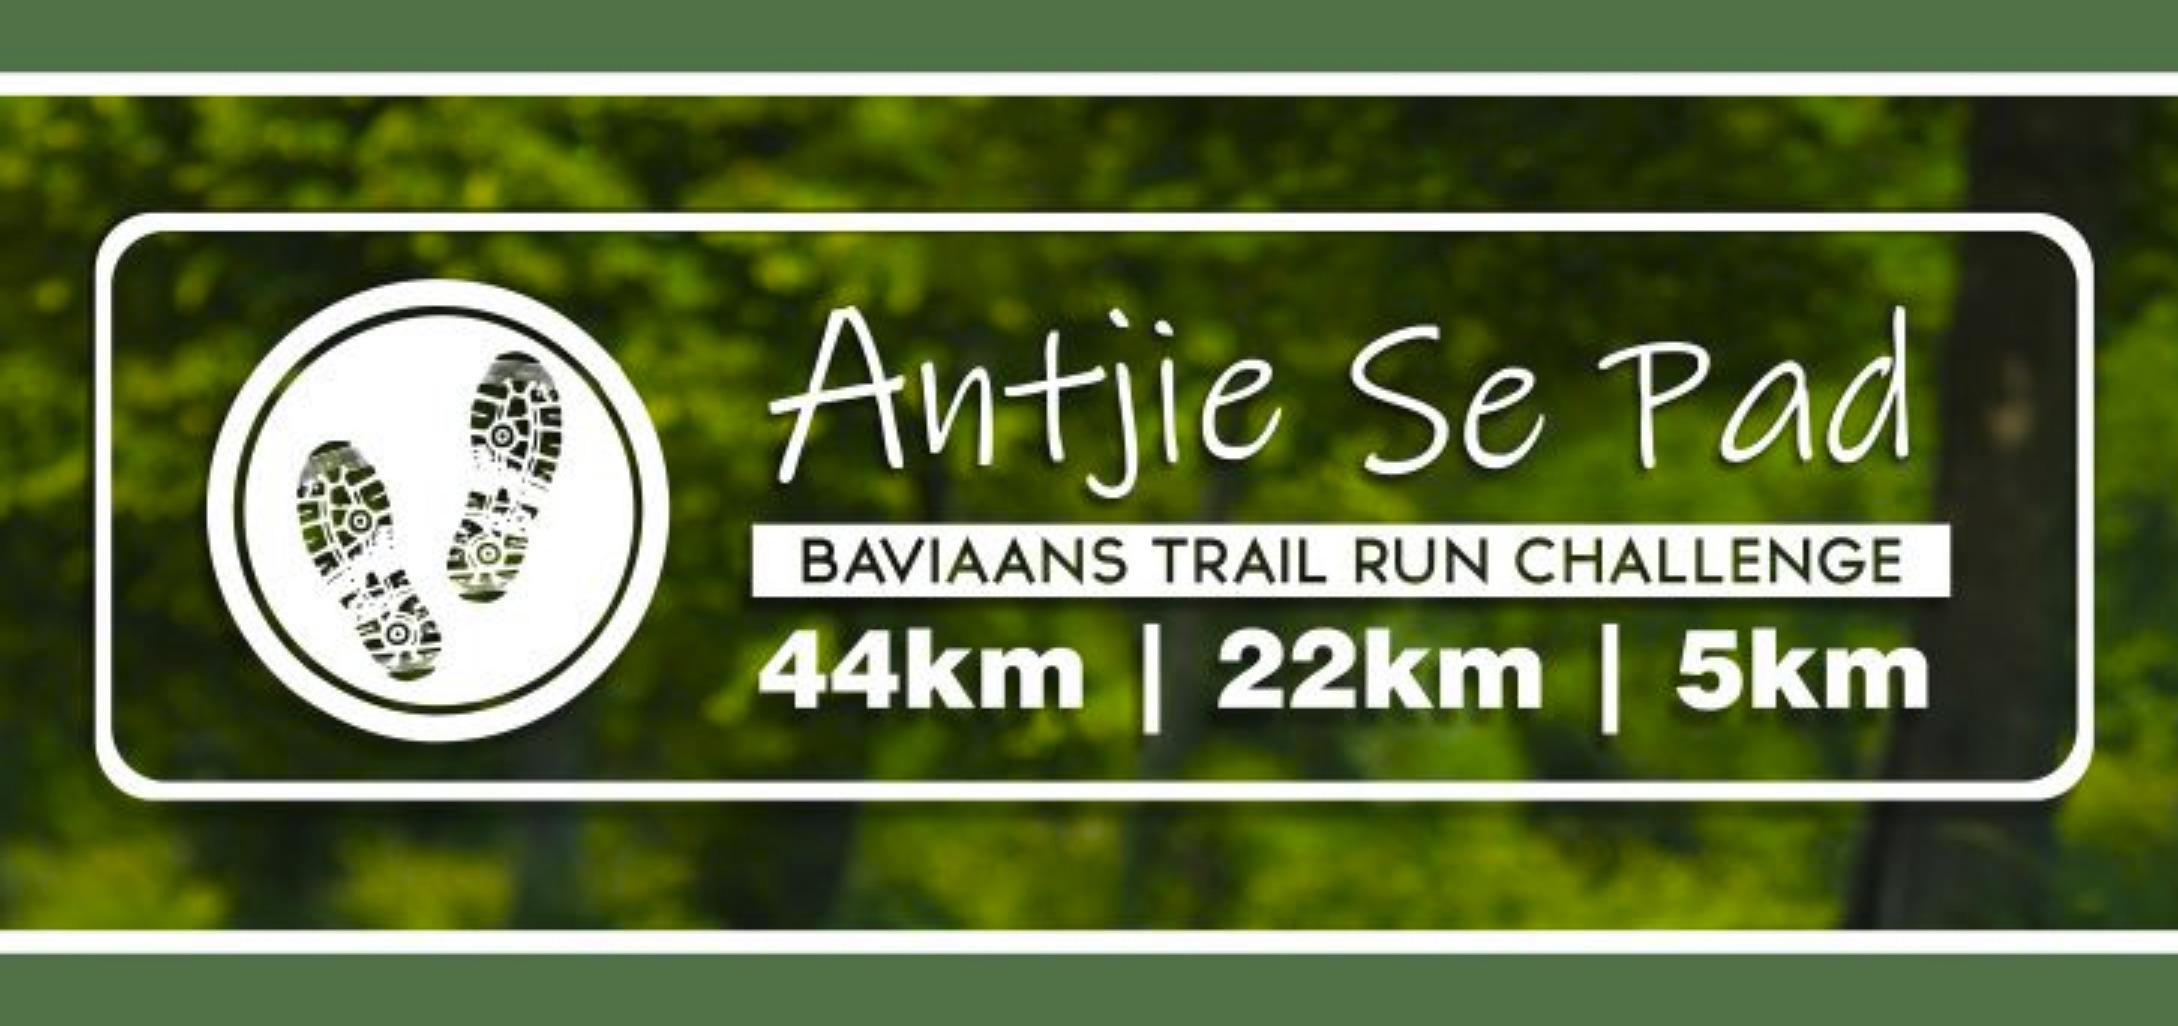 Antjie Se Pad Baviaans Trail Run Challenge - cover image